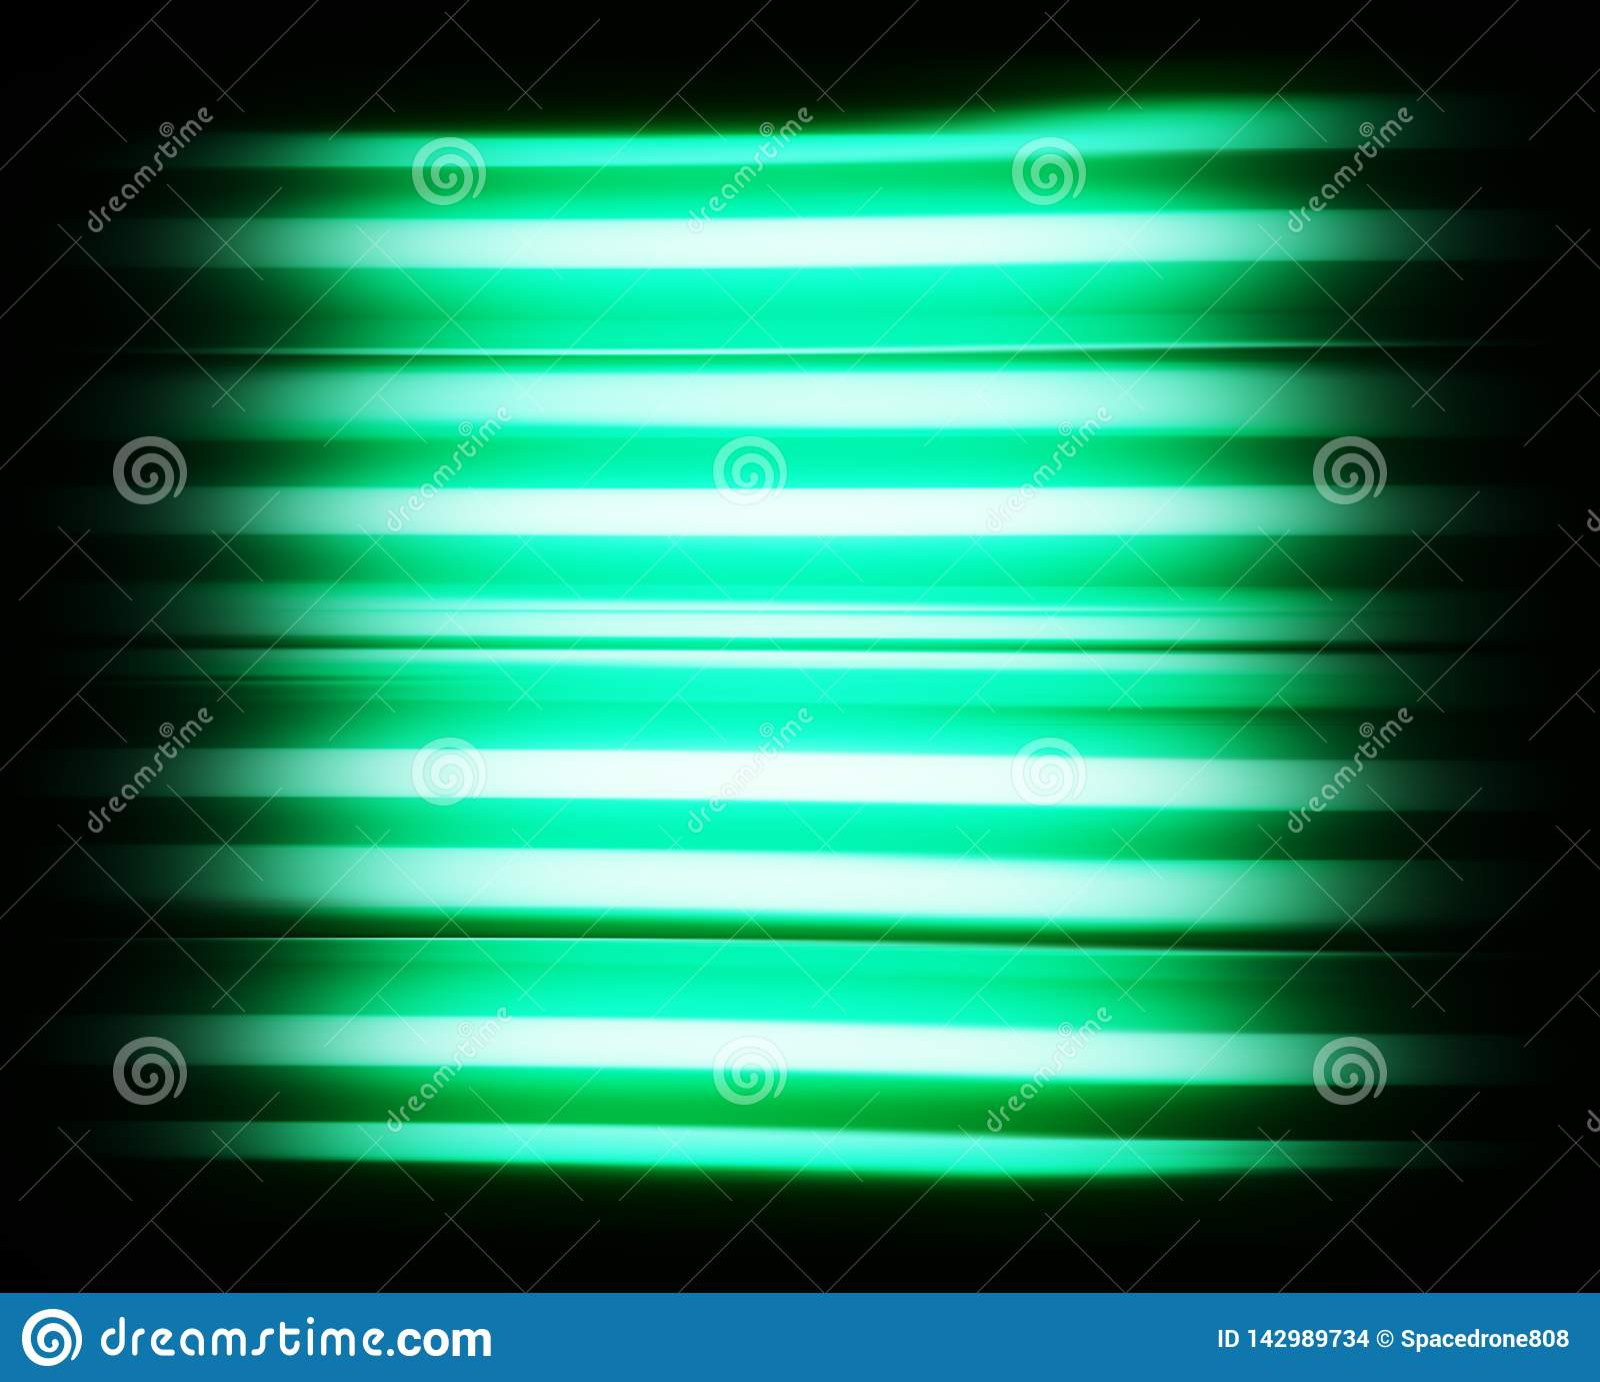 Aqua green scanline tv no signal background